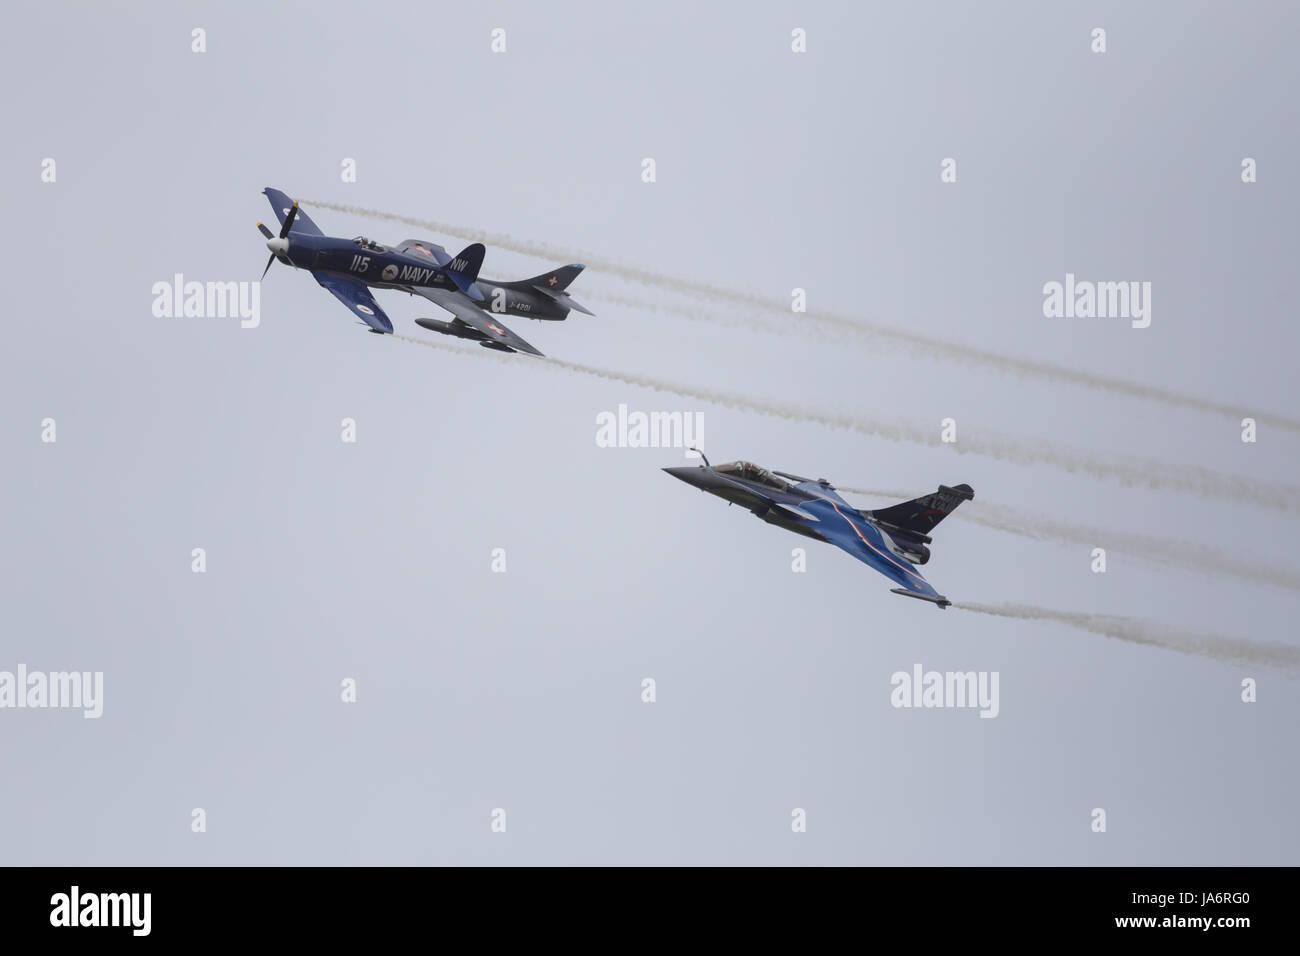 La Ferte Alais, France. 4th June, 2017. Planes in formation in the skies above the Aerodrome de Cerny, La Ferte - Stock Image